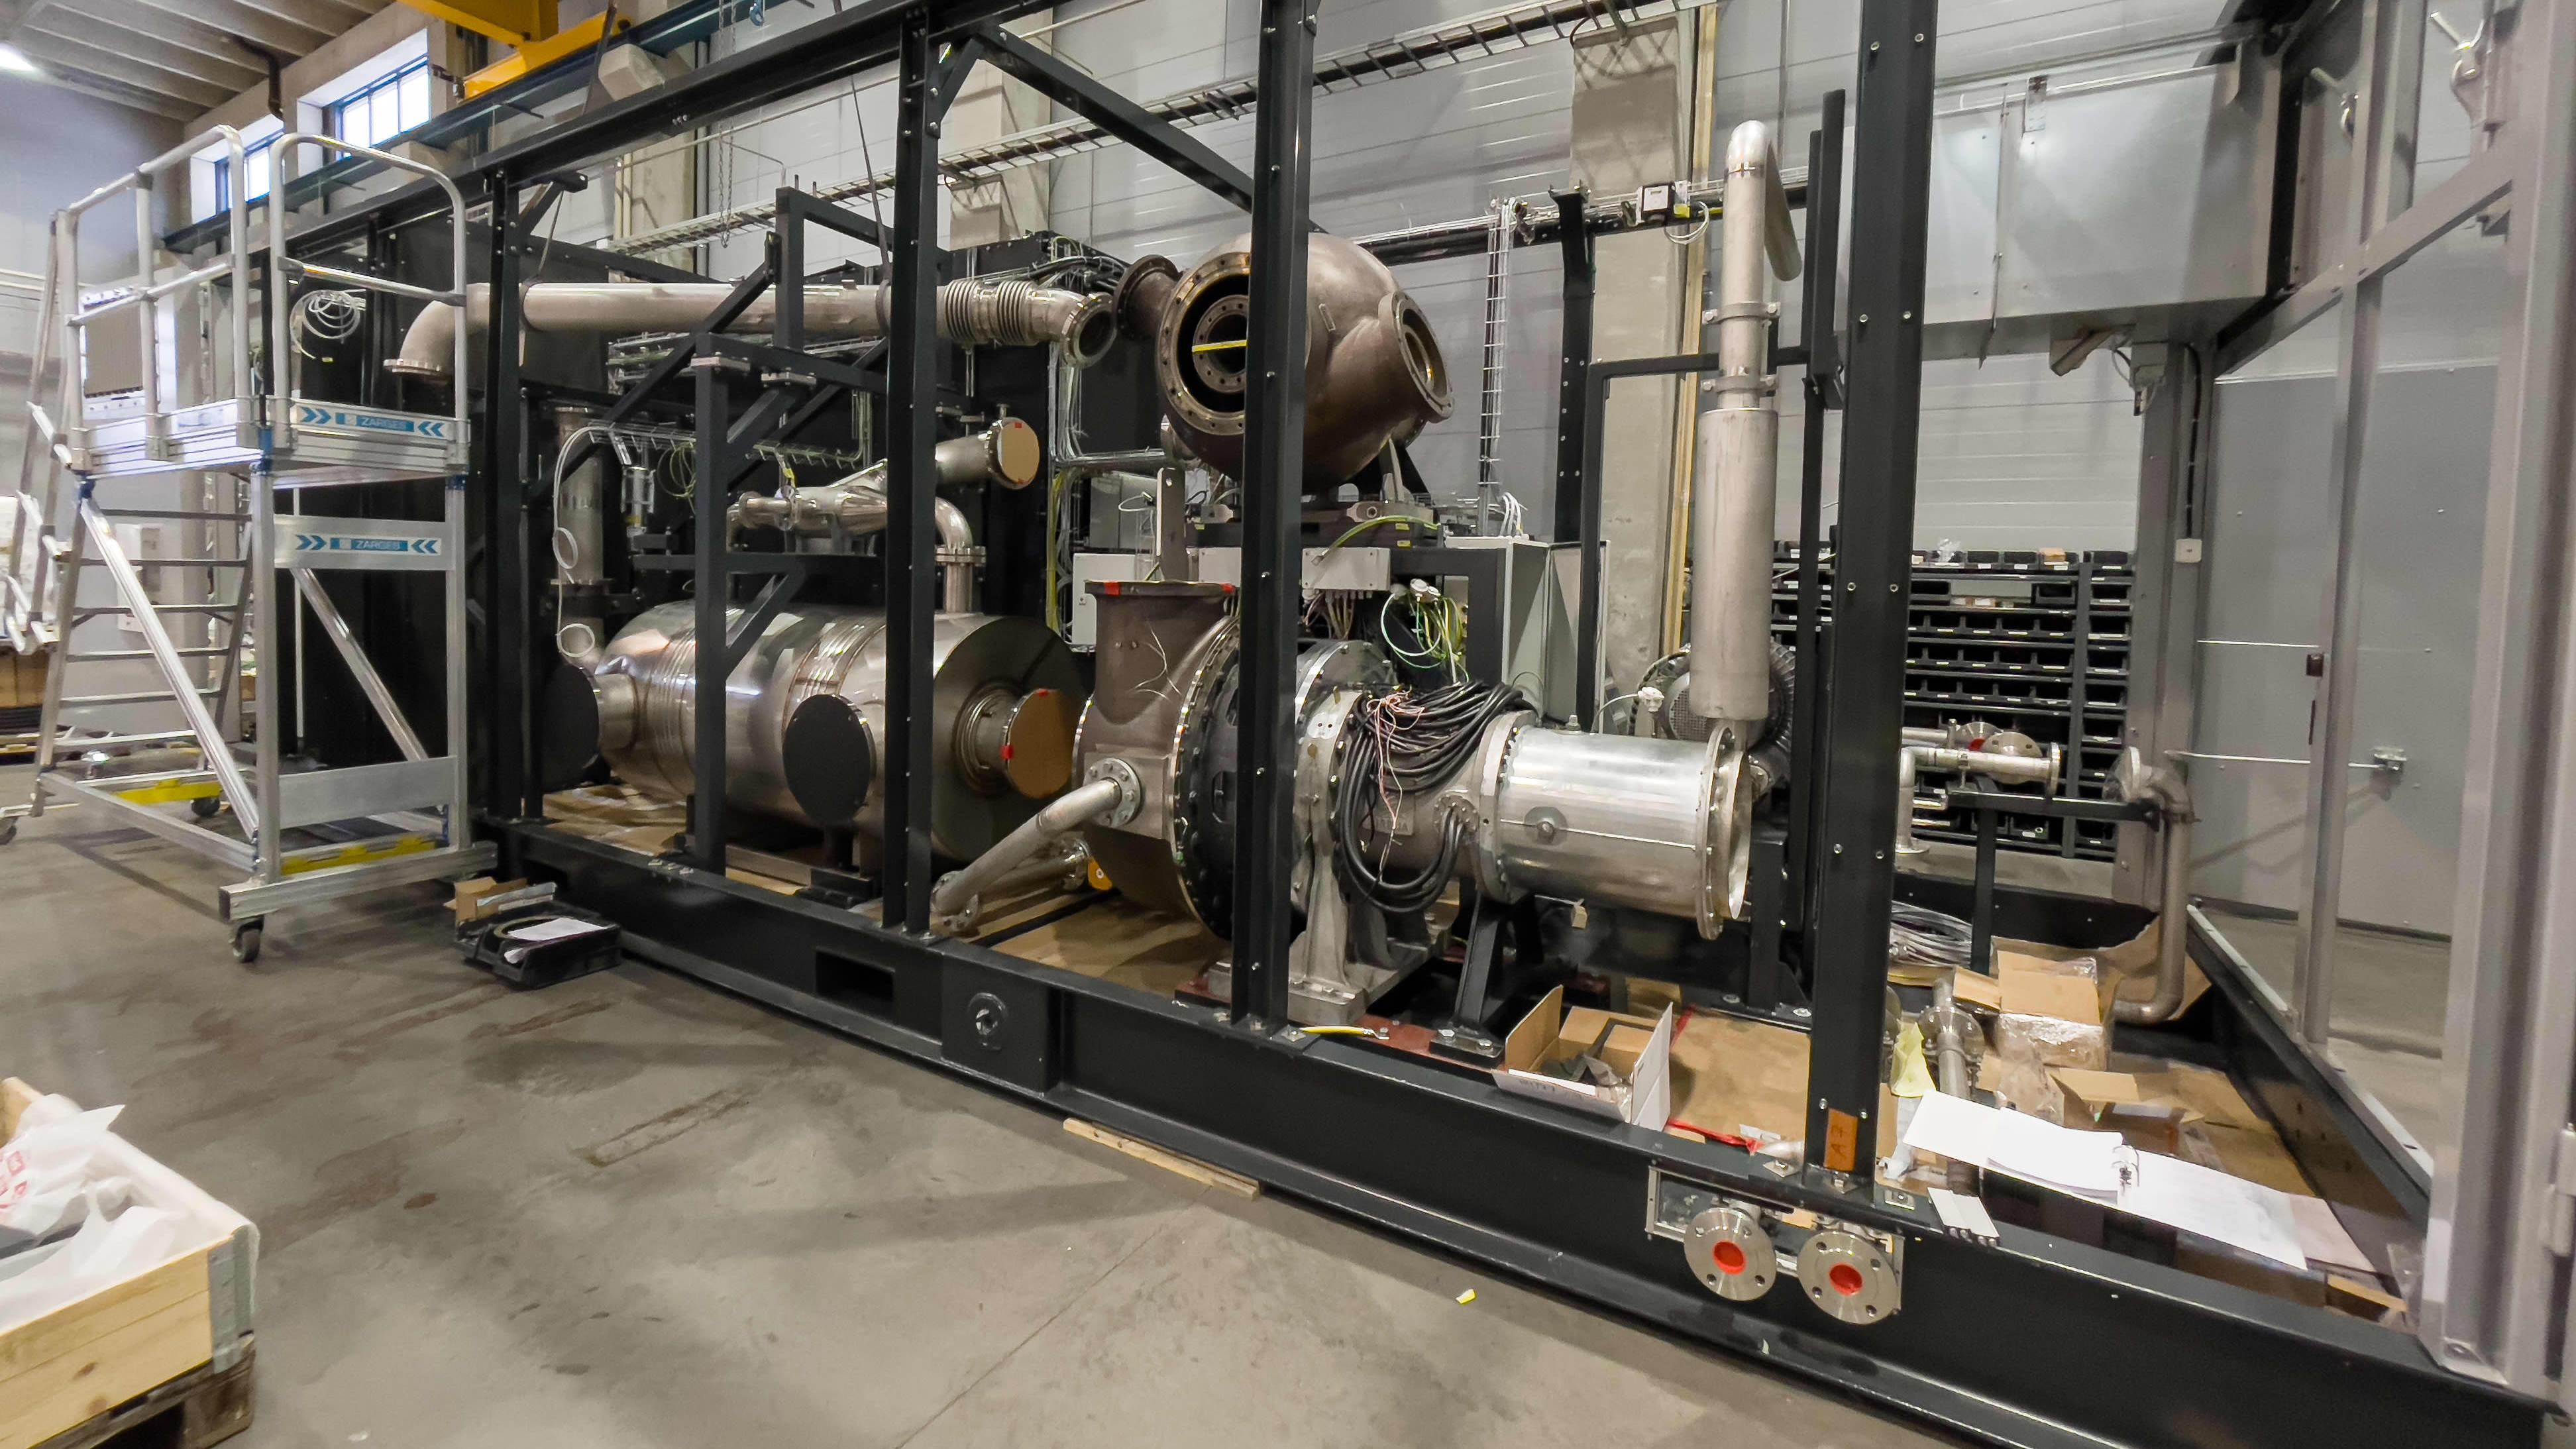 Aurelia Turbines pienvoimala jonka sisällä tehokas kaasuturbiini.